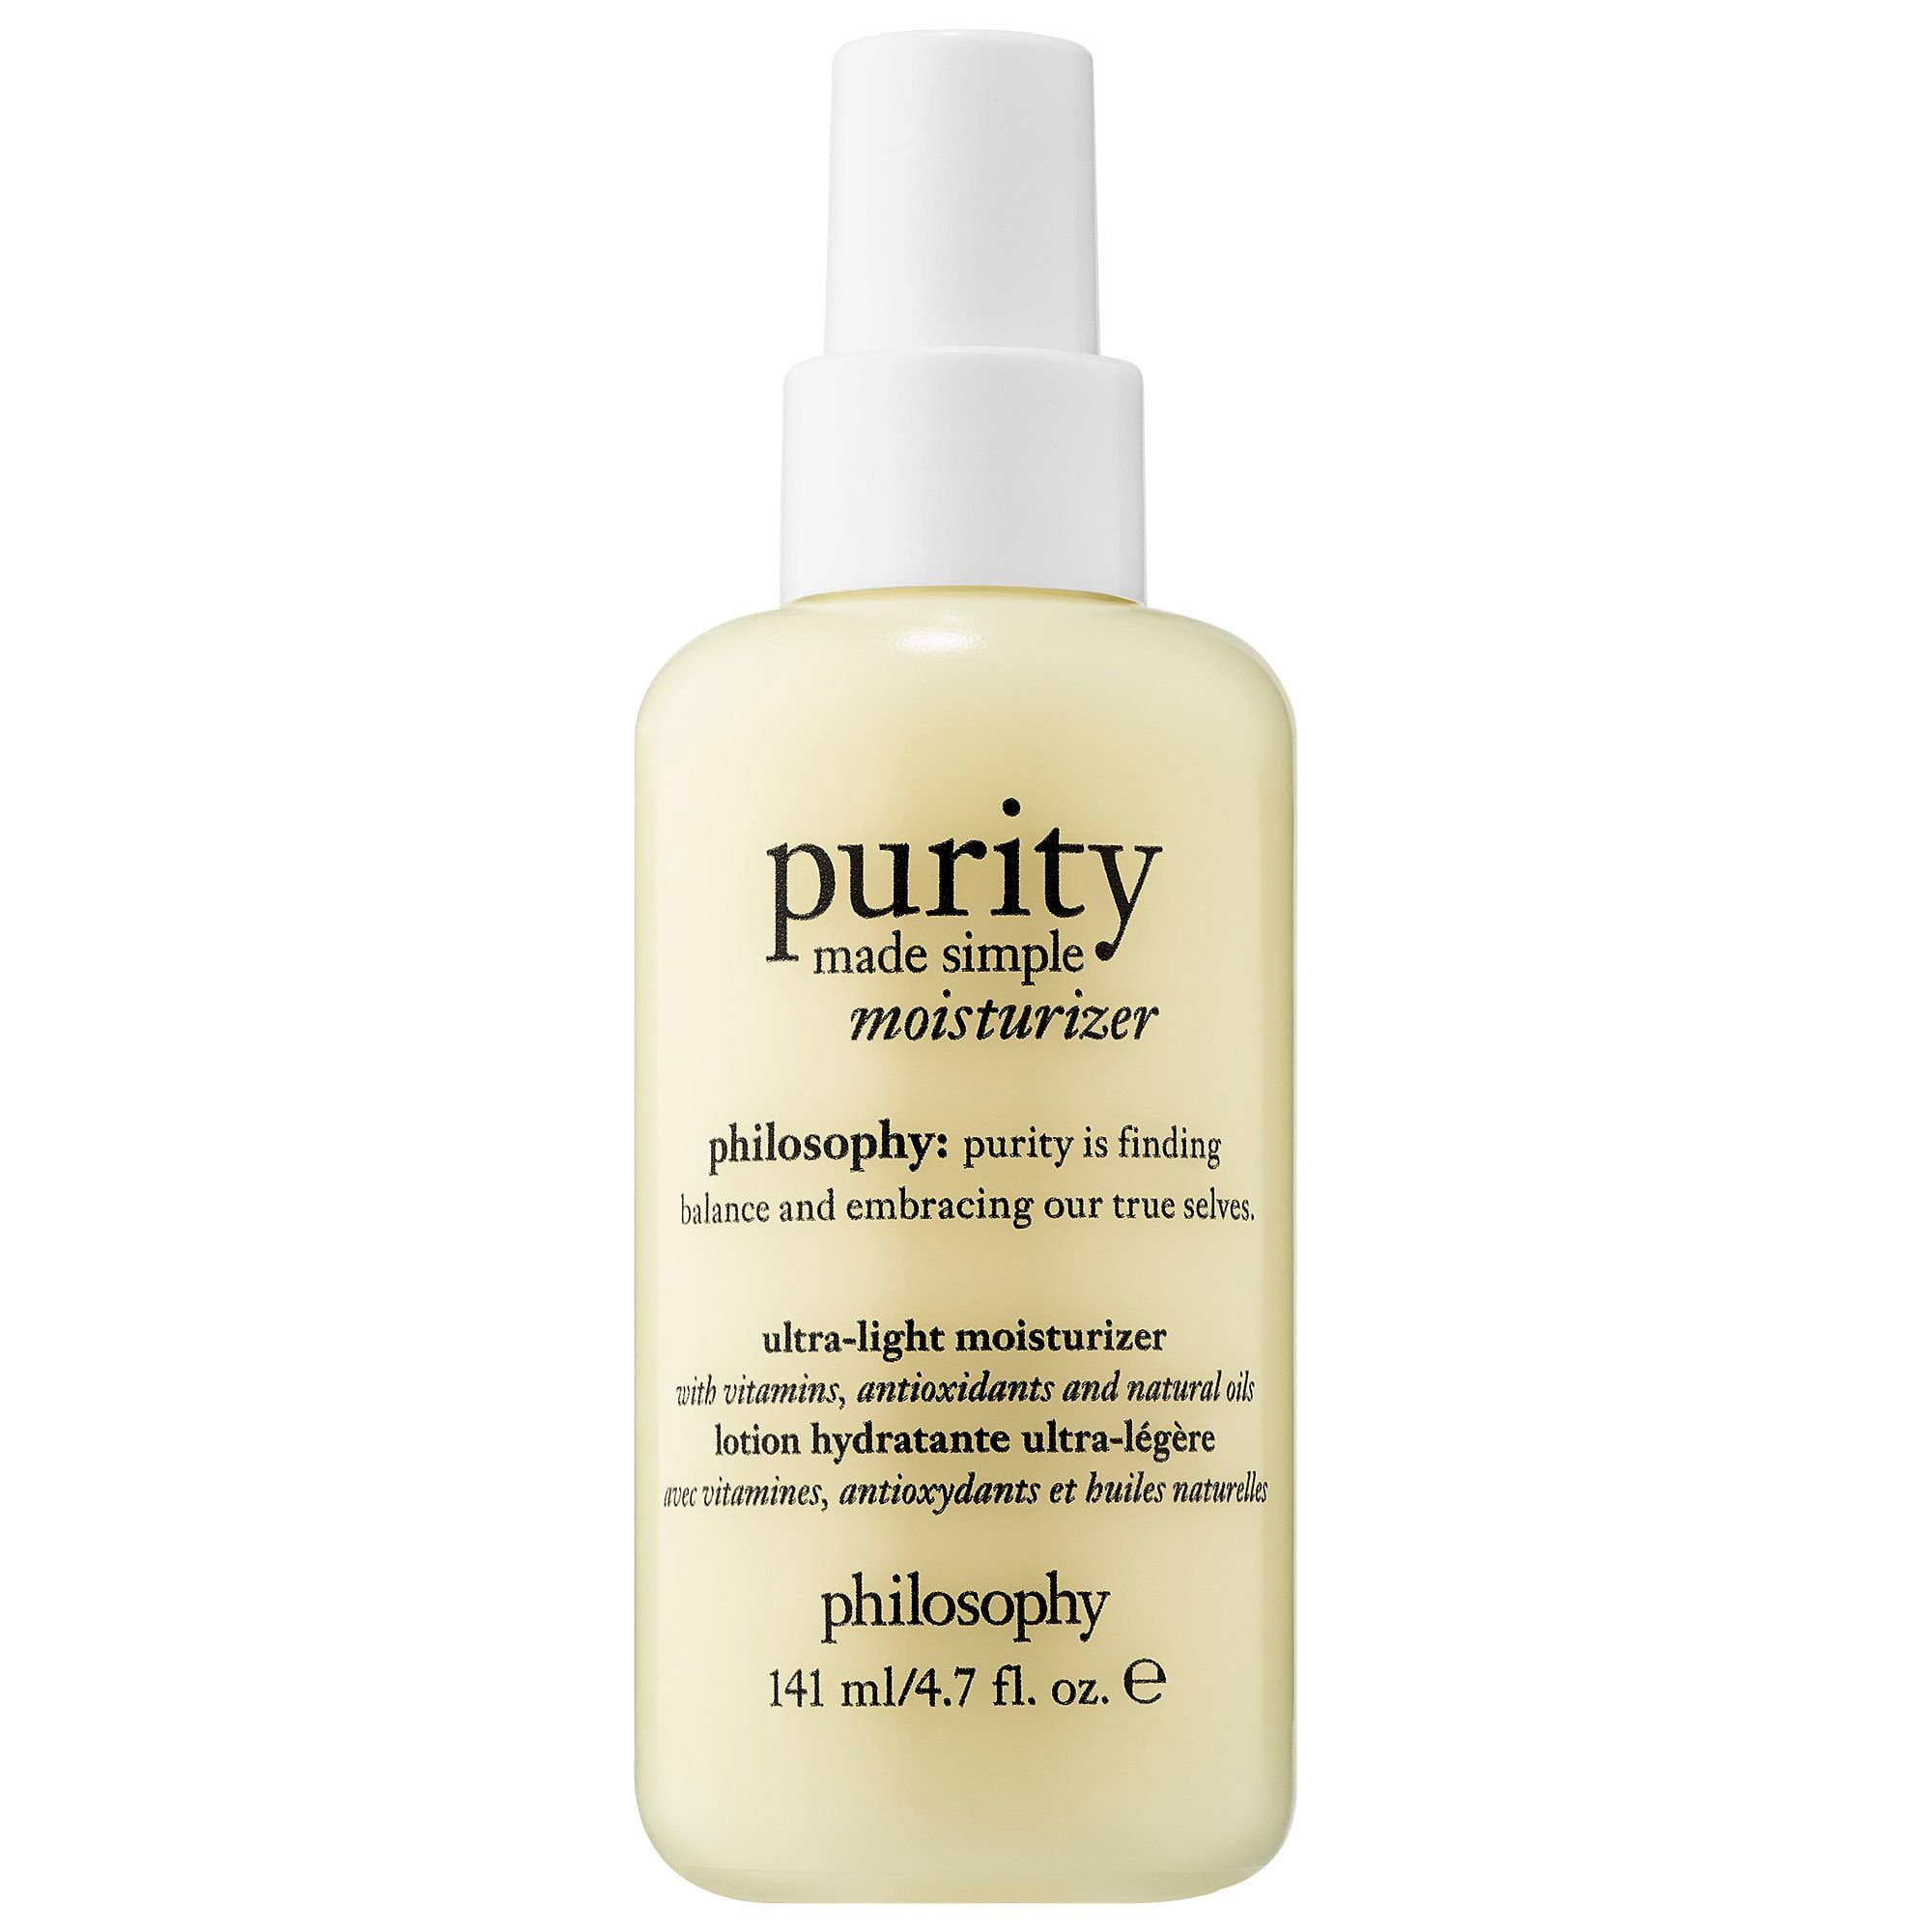 Purity Made Simple Ultra Light Moisturizer Philosophy Sephora Light Moisturizer Purity Made Simple Moisturizer For Sensitive Skin